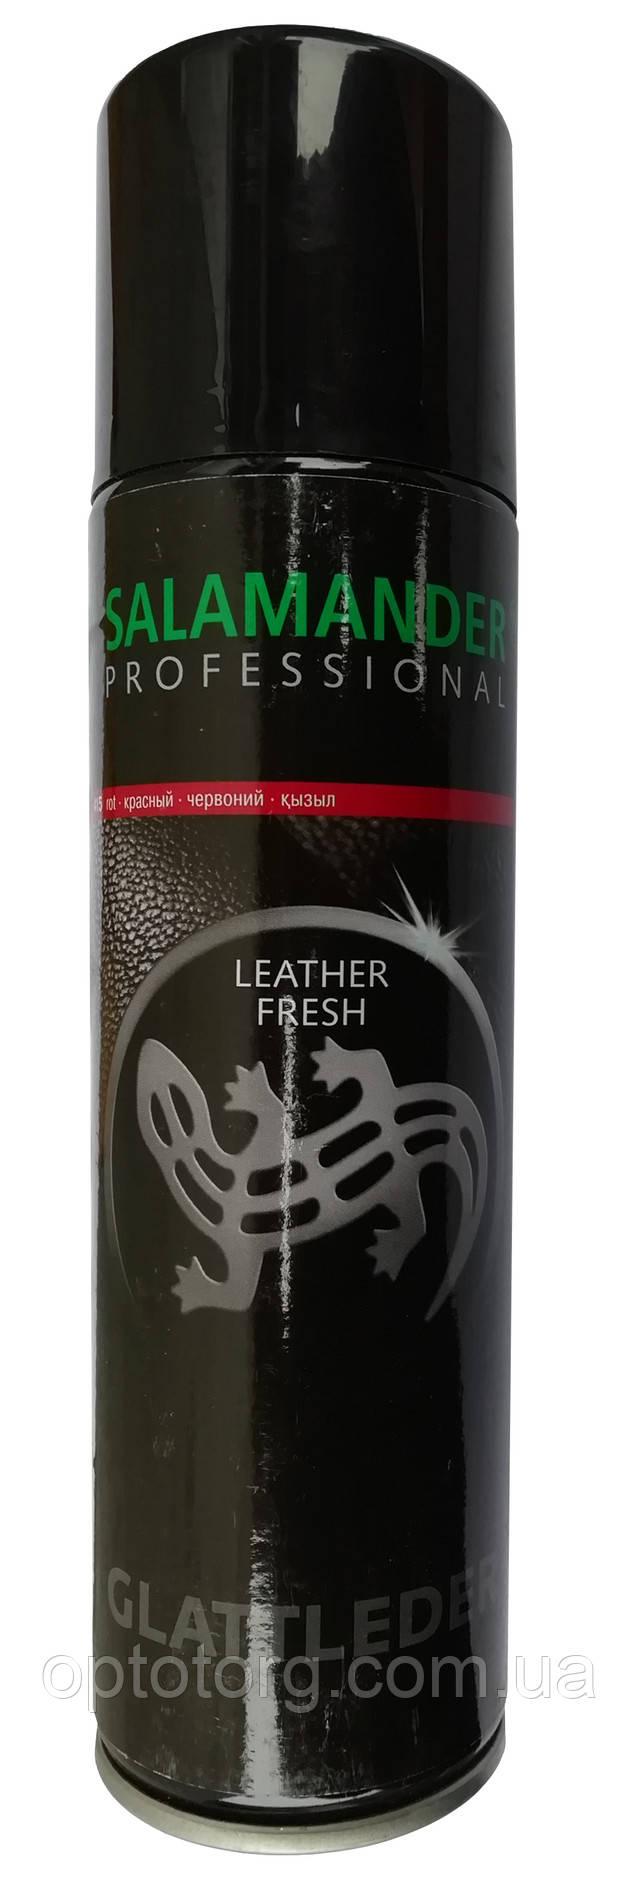 Фарба червона для гладкої шкіри Саламандра Професионал Salamander Professional